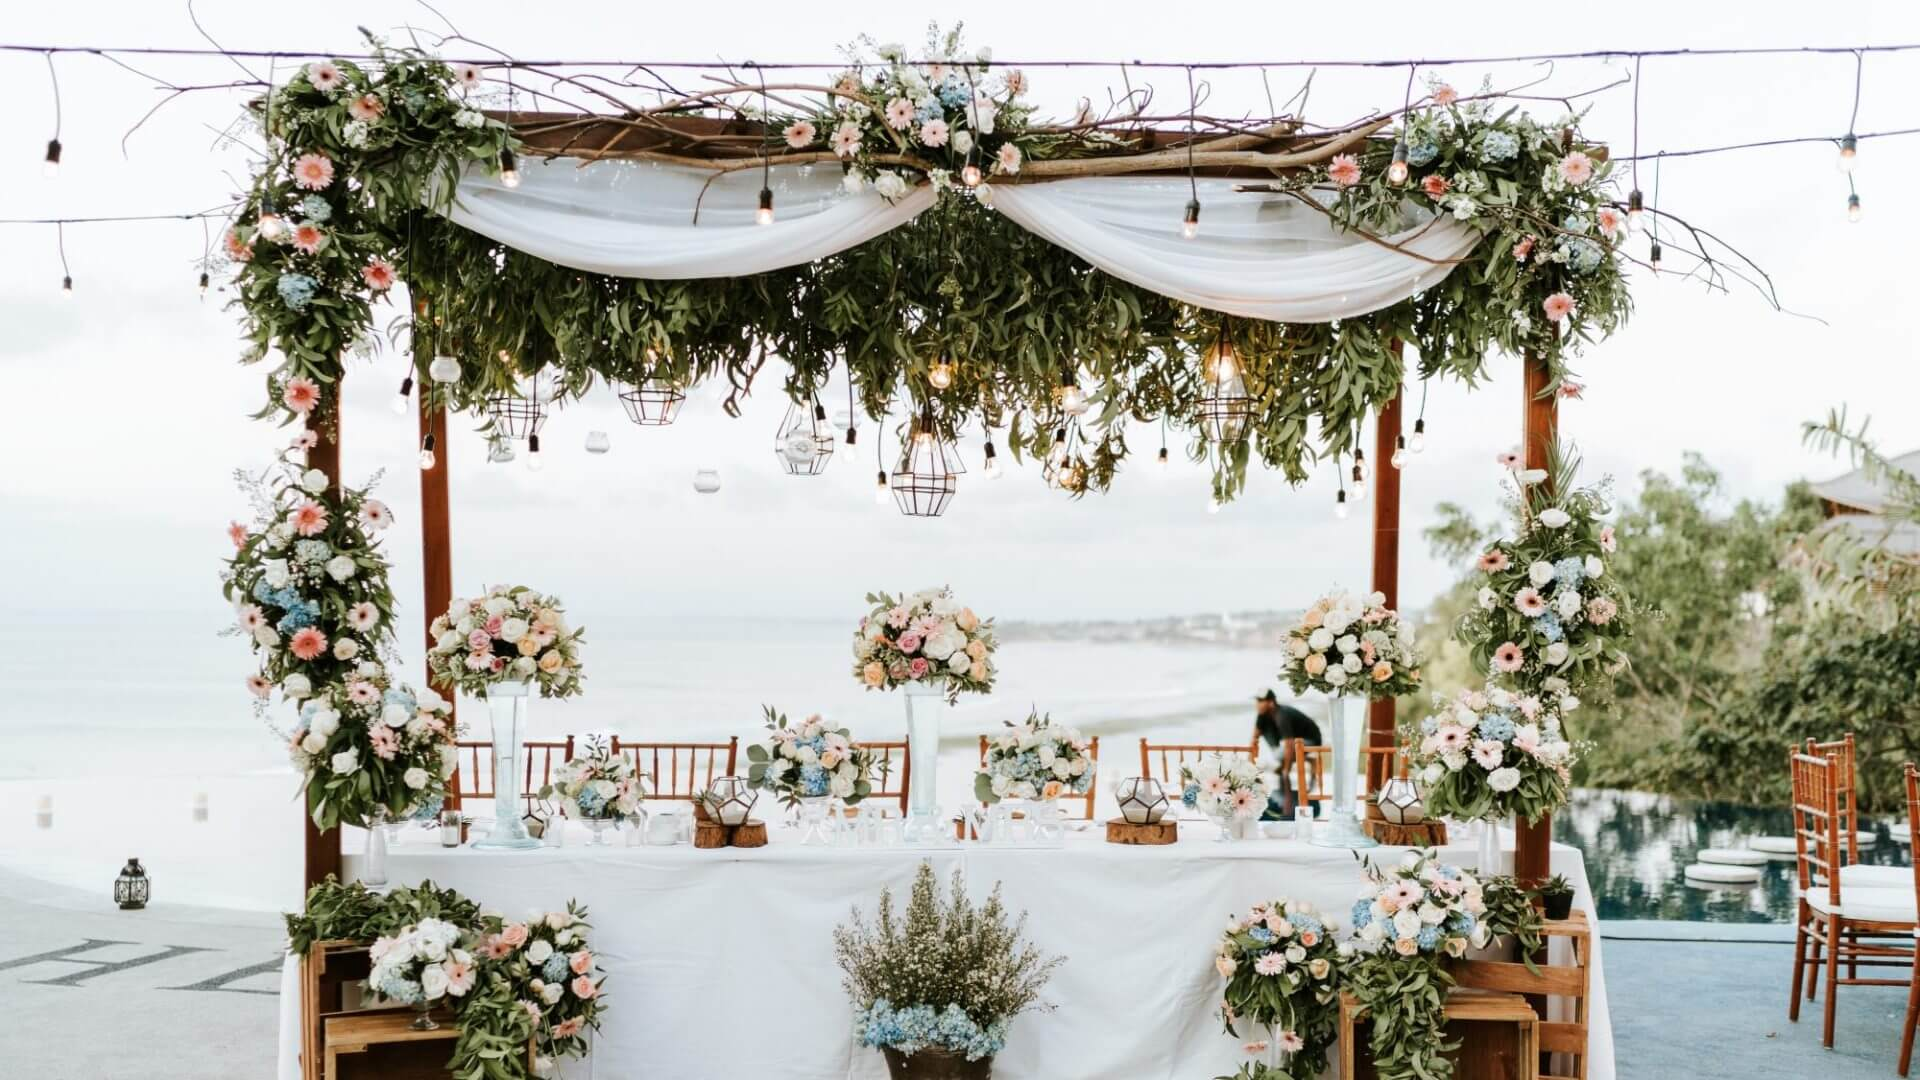 Delivery - 5 Prinsip Bisnis Wedding Organizer yang Perlu Kamu Ketahui